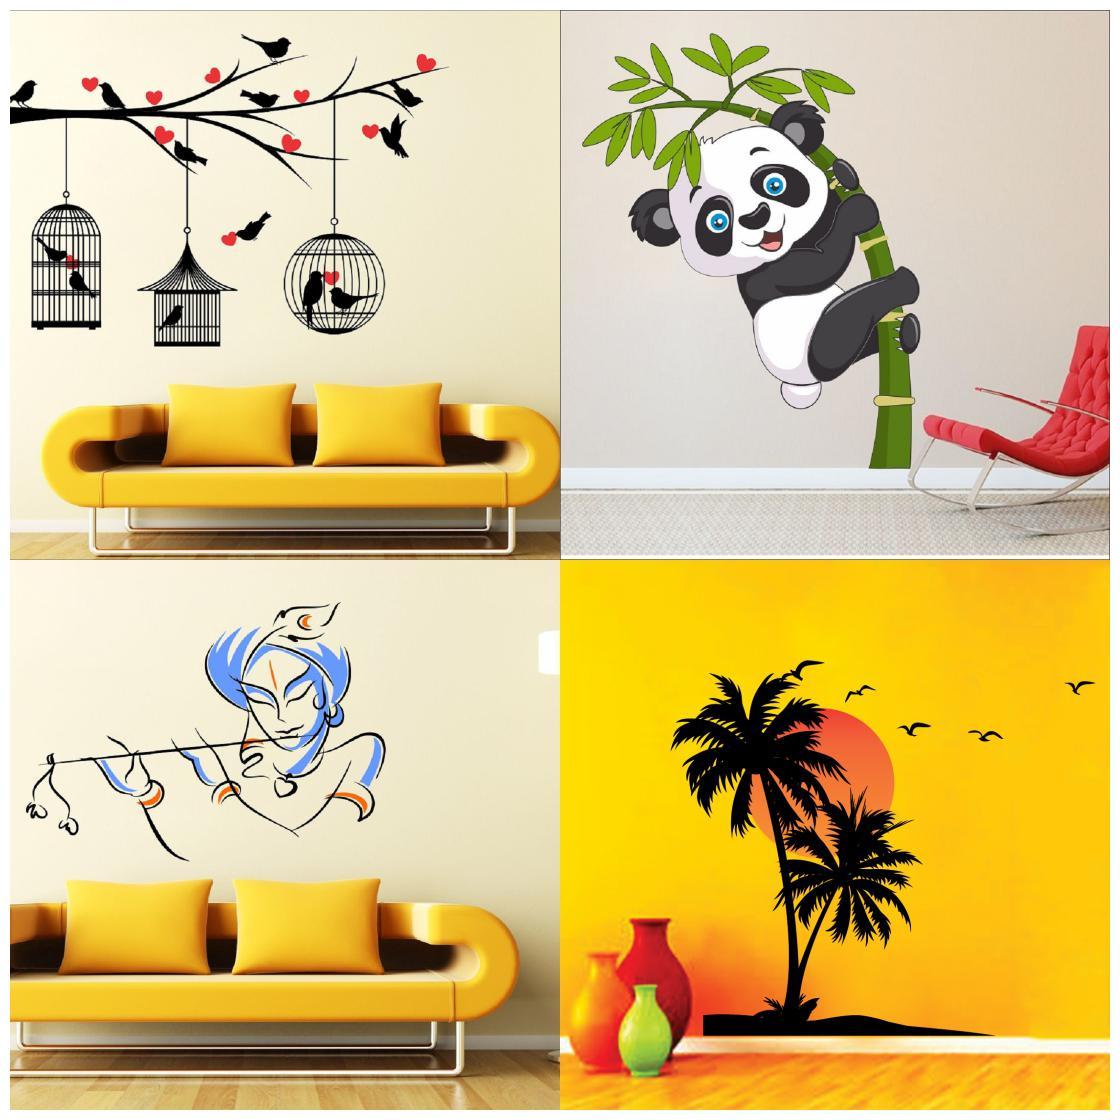 g637 Vinyl Wall Decal Tree Roots Brain Smart Creative Art Idea Stickers Mural